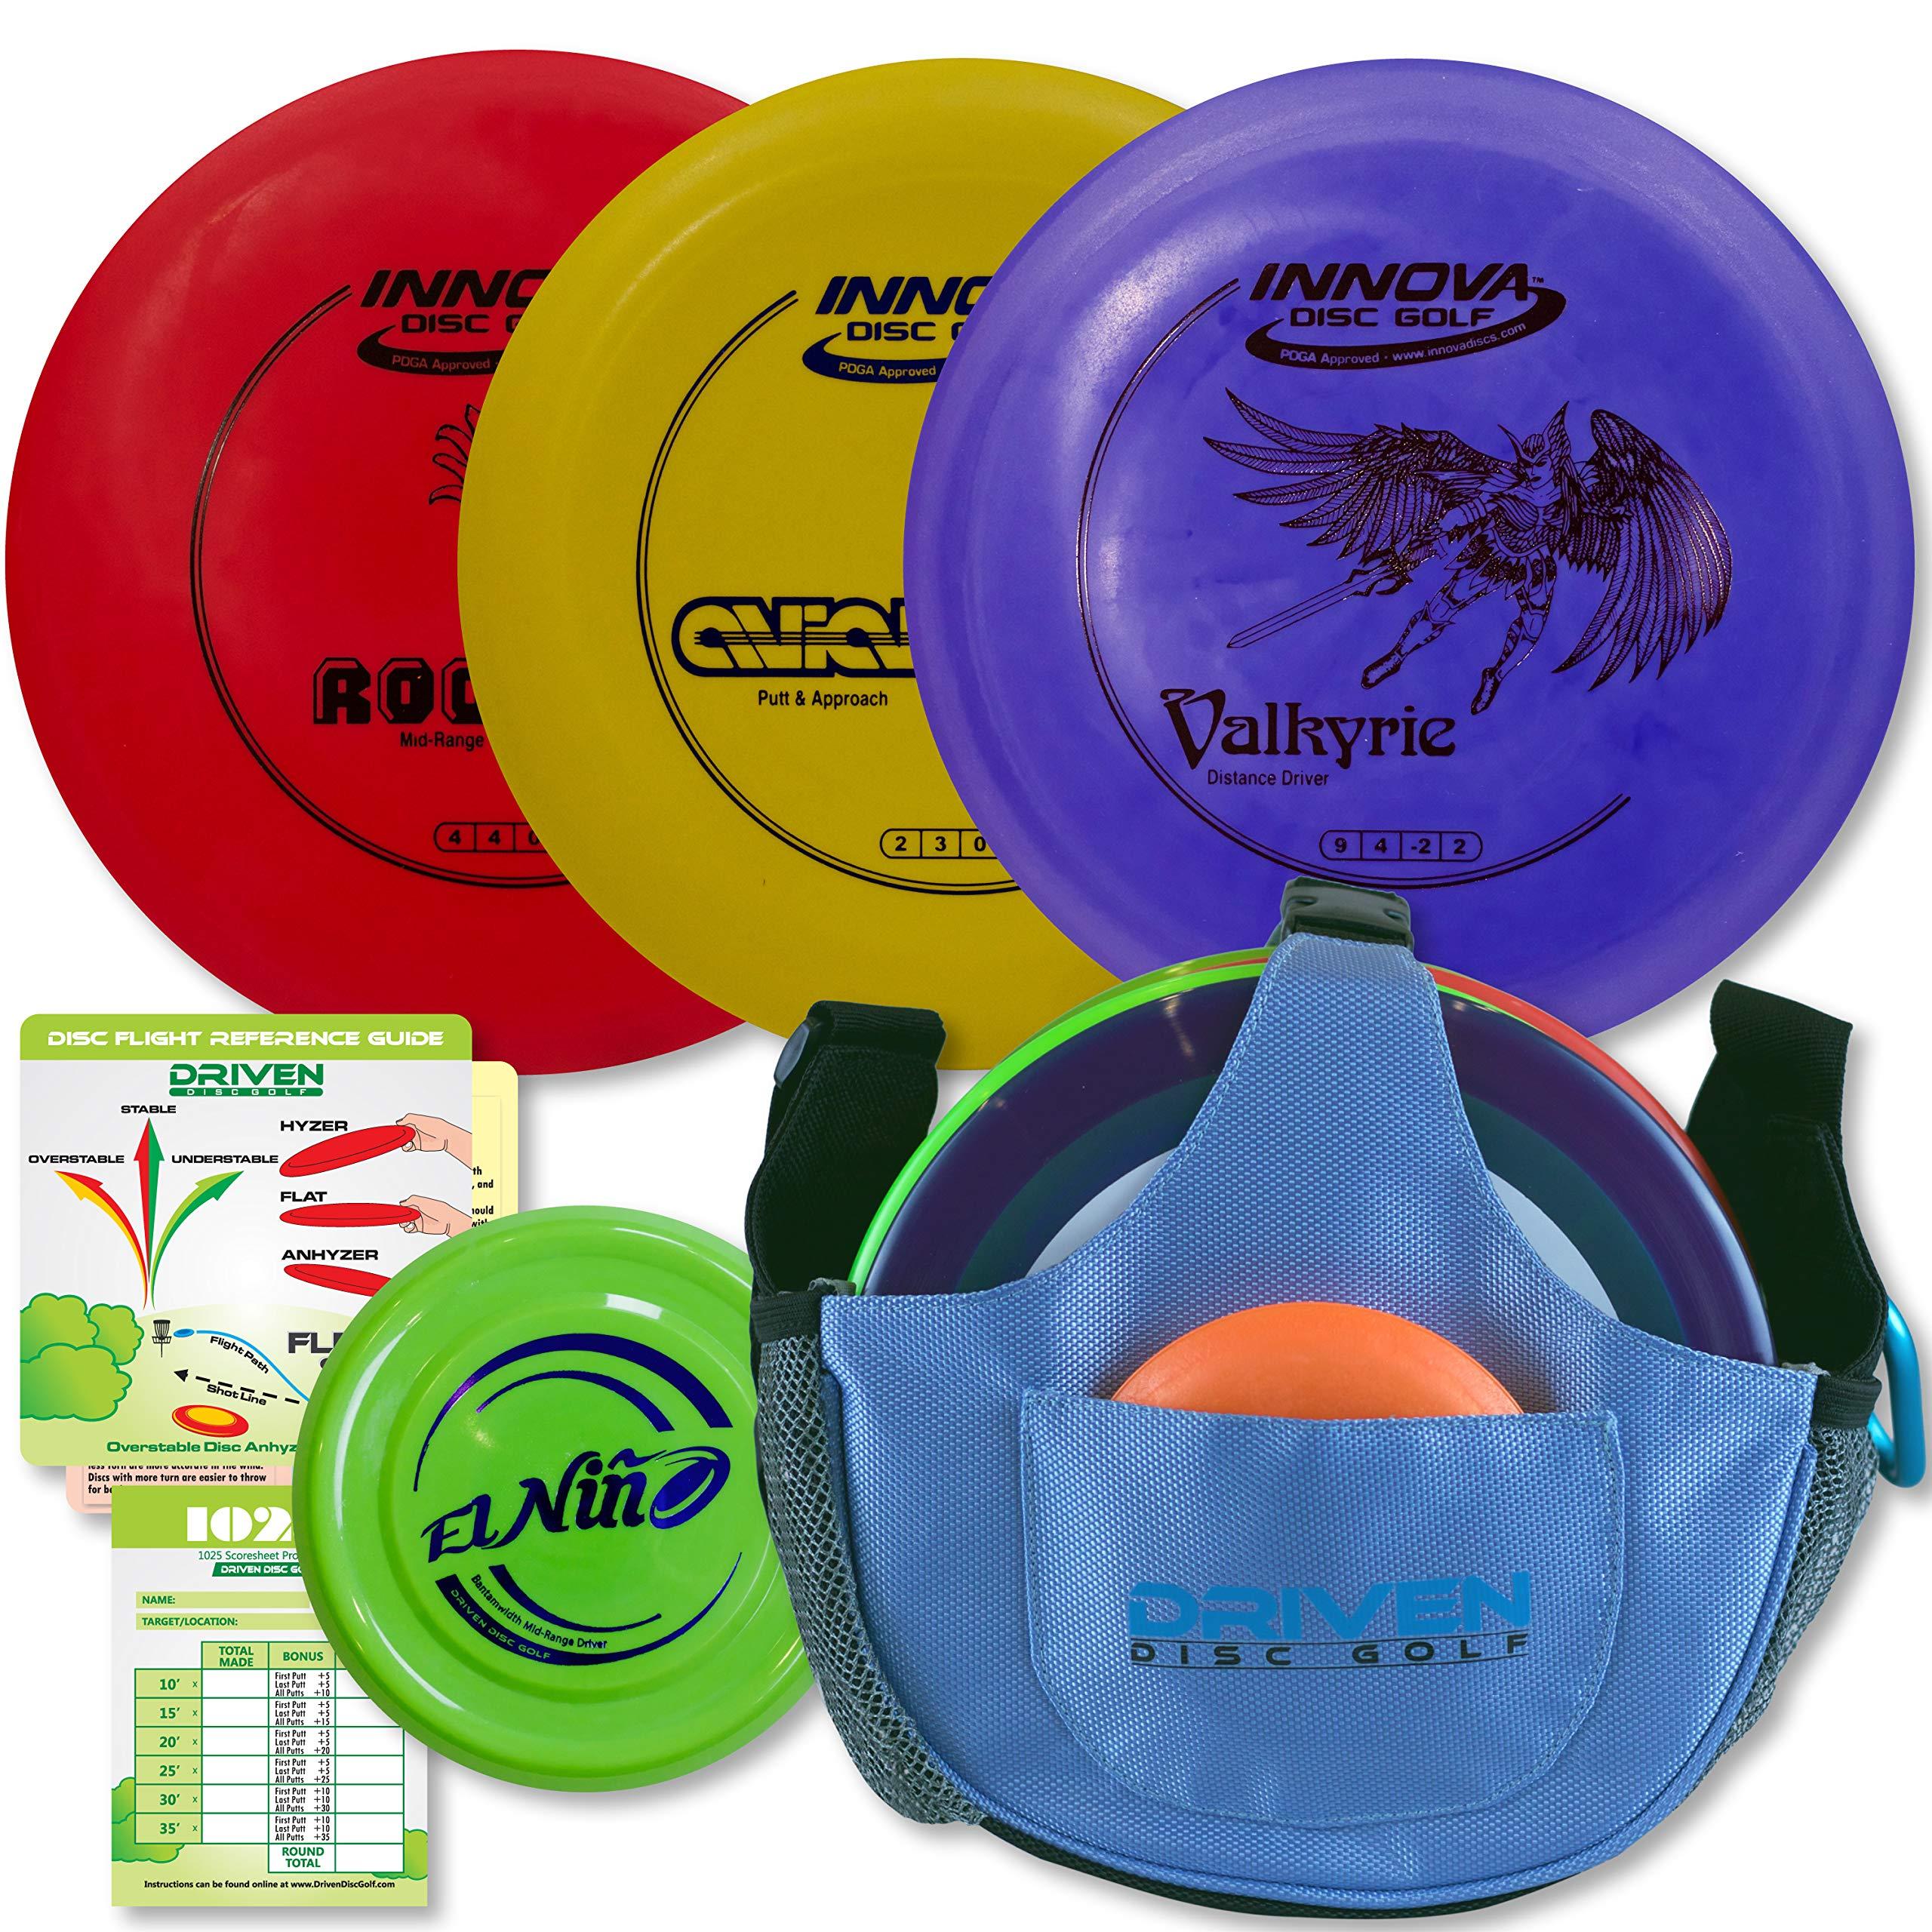 Driven Disc Golf Starter Set - 3 Disc Set with Bag by Driven Disc Golf